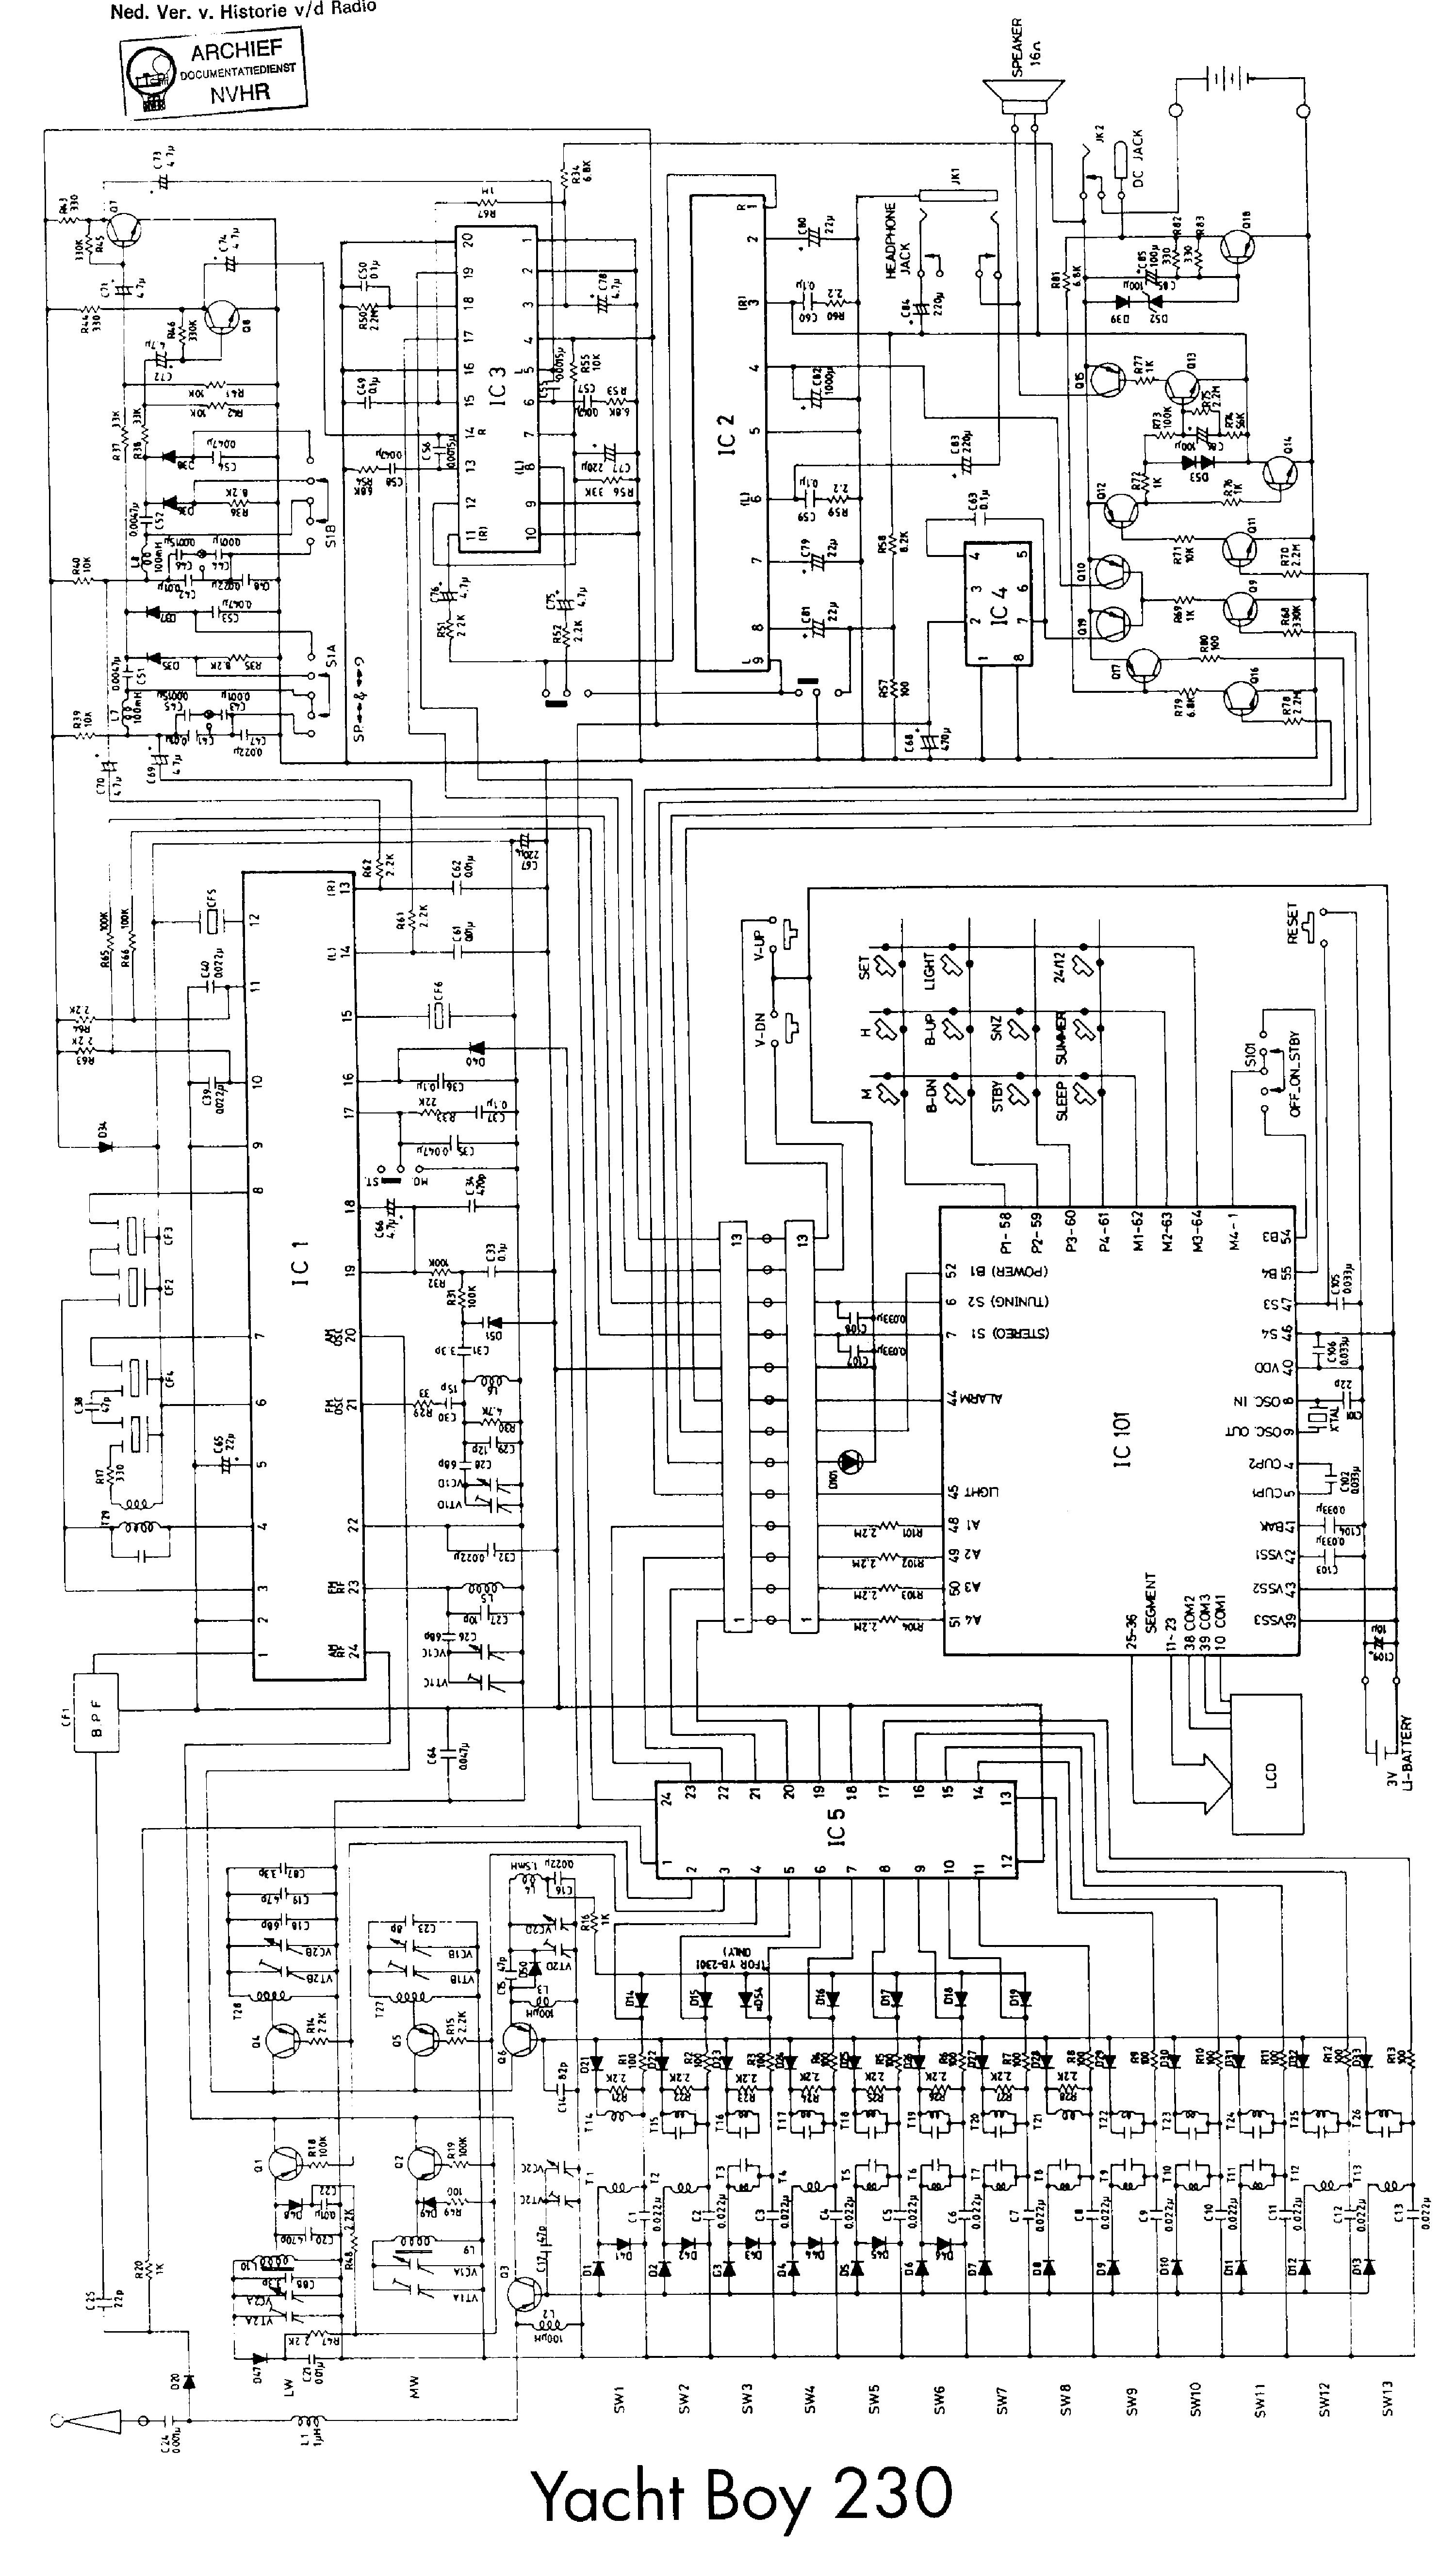 Gemütlich Integra Schaltplan Bilder - Schaltplan Serie Circuit ...